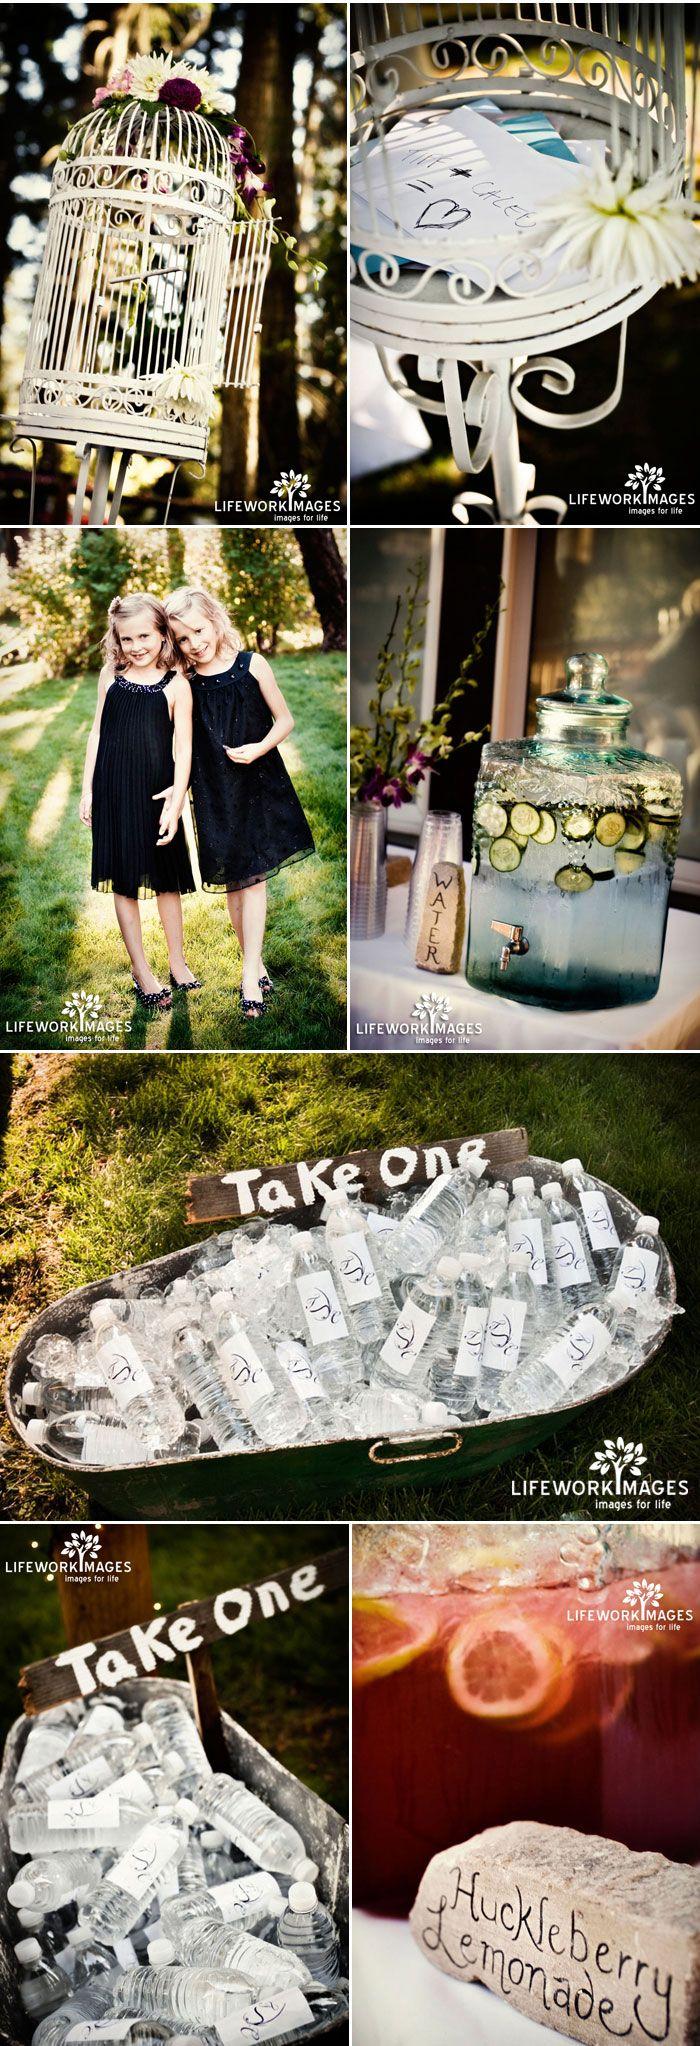 cute ideas for outside on the tennis lawn wedding ideas